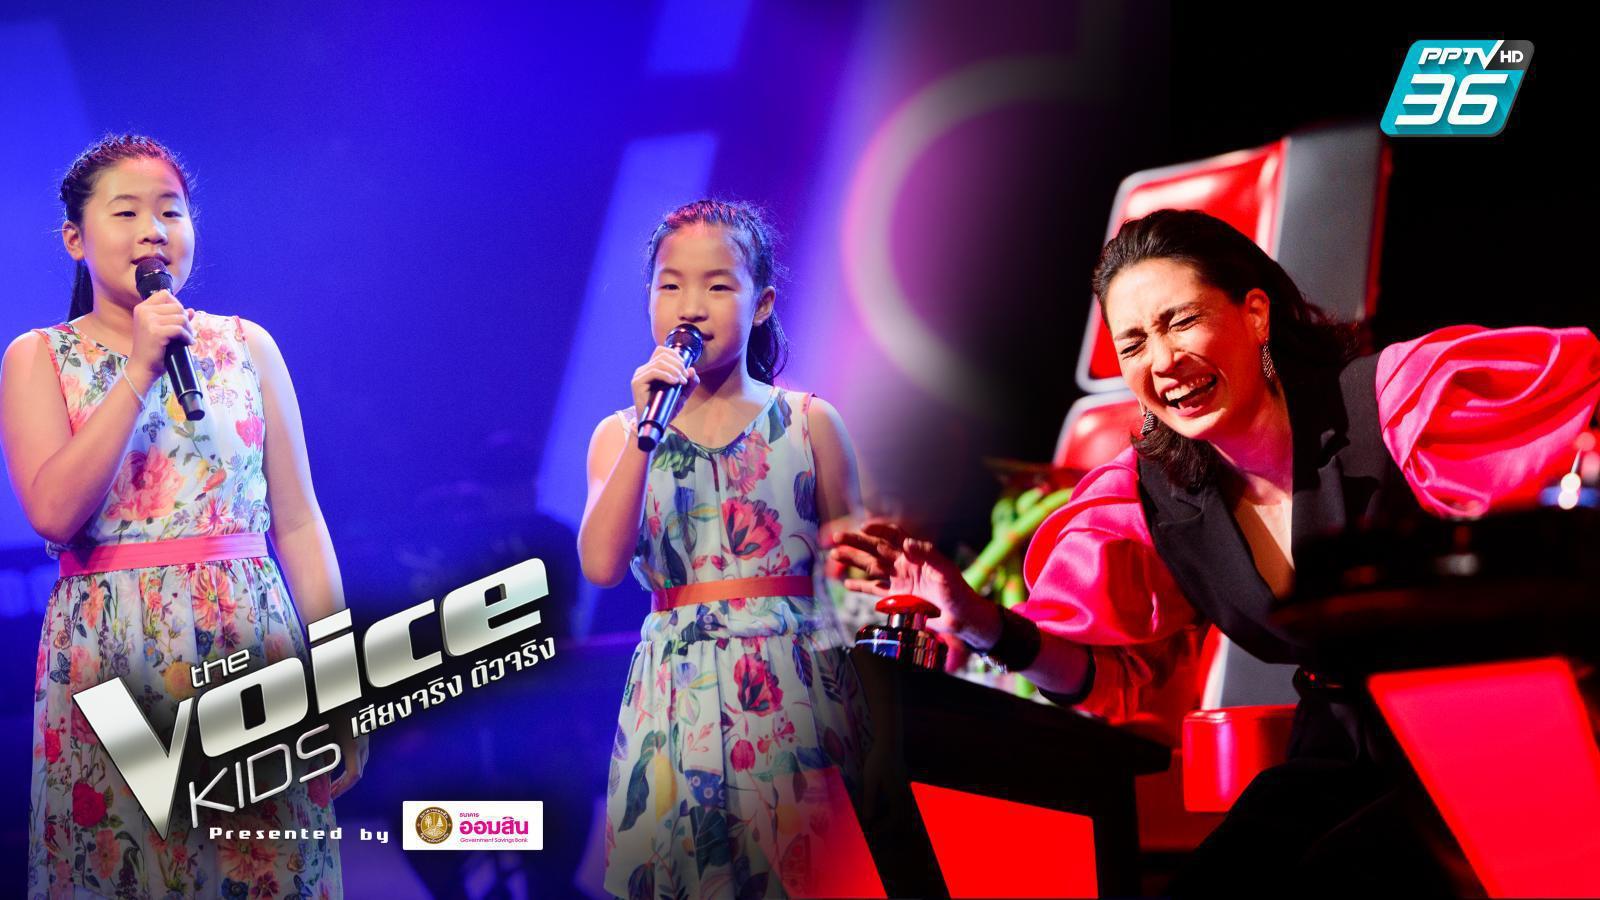 The Voice Kids 2020 | Blind Auditions ครั้งที่5 | แฝดเสียงหวาน ไลน์ประสานที่โค้ชตามหา!